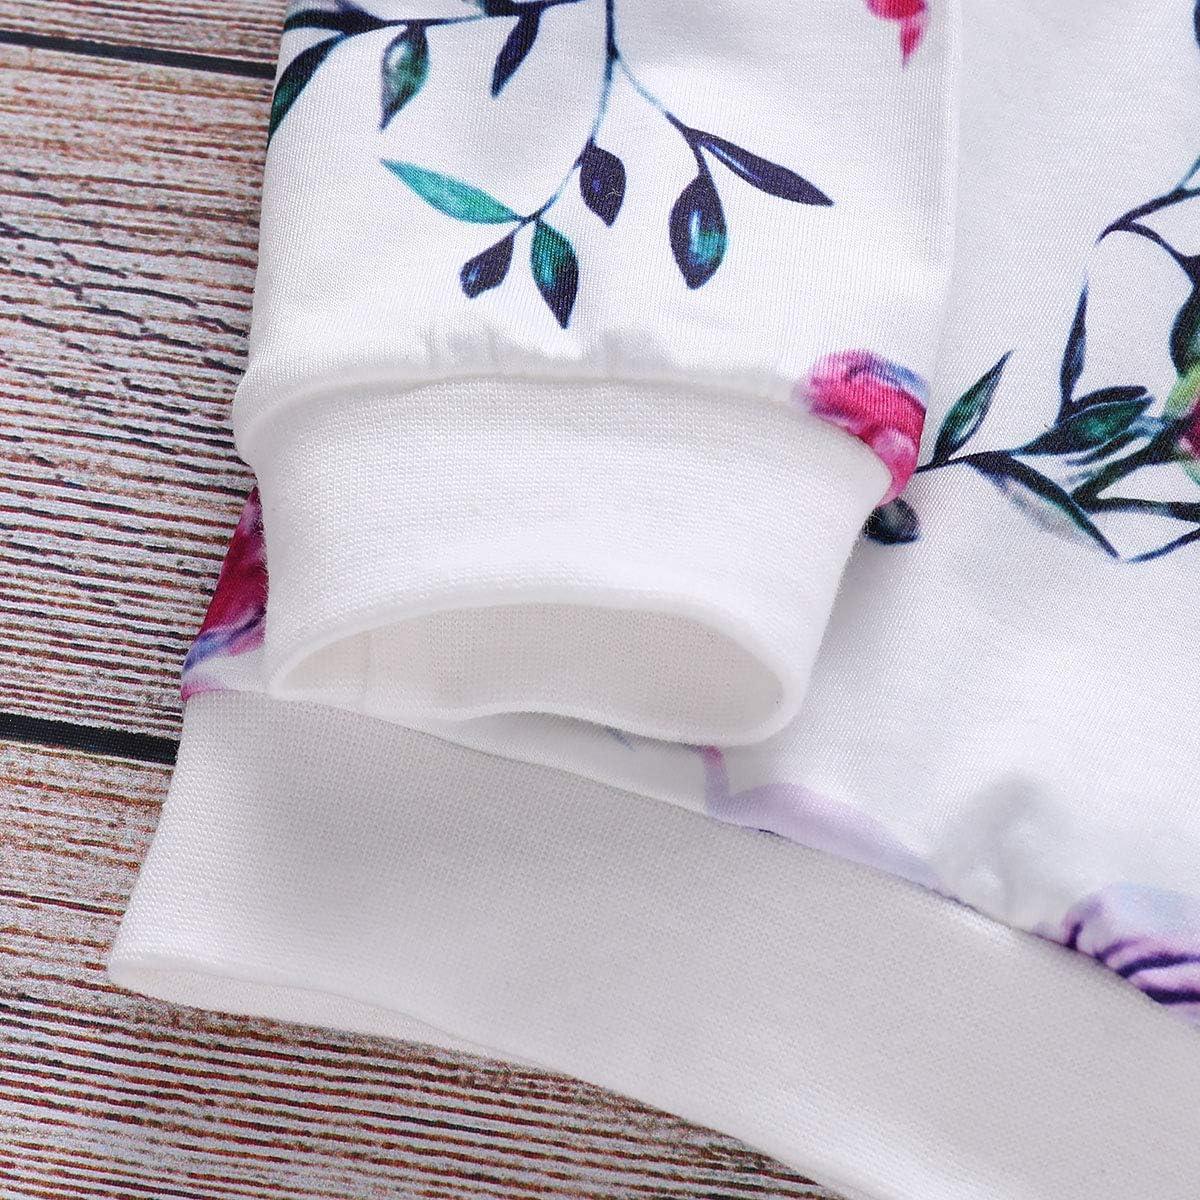 T-Shirt PICK YOUR LOOK Baby M/ädchen Kleidung f/ür Neugeborene mit floralem Muster Outfit-Set Hose lang/ärmelig Tops 2 St/ück f/ür 0-2 Jahre